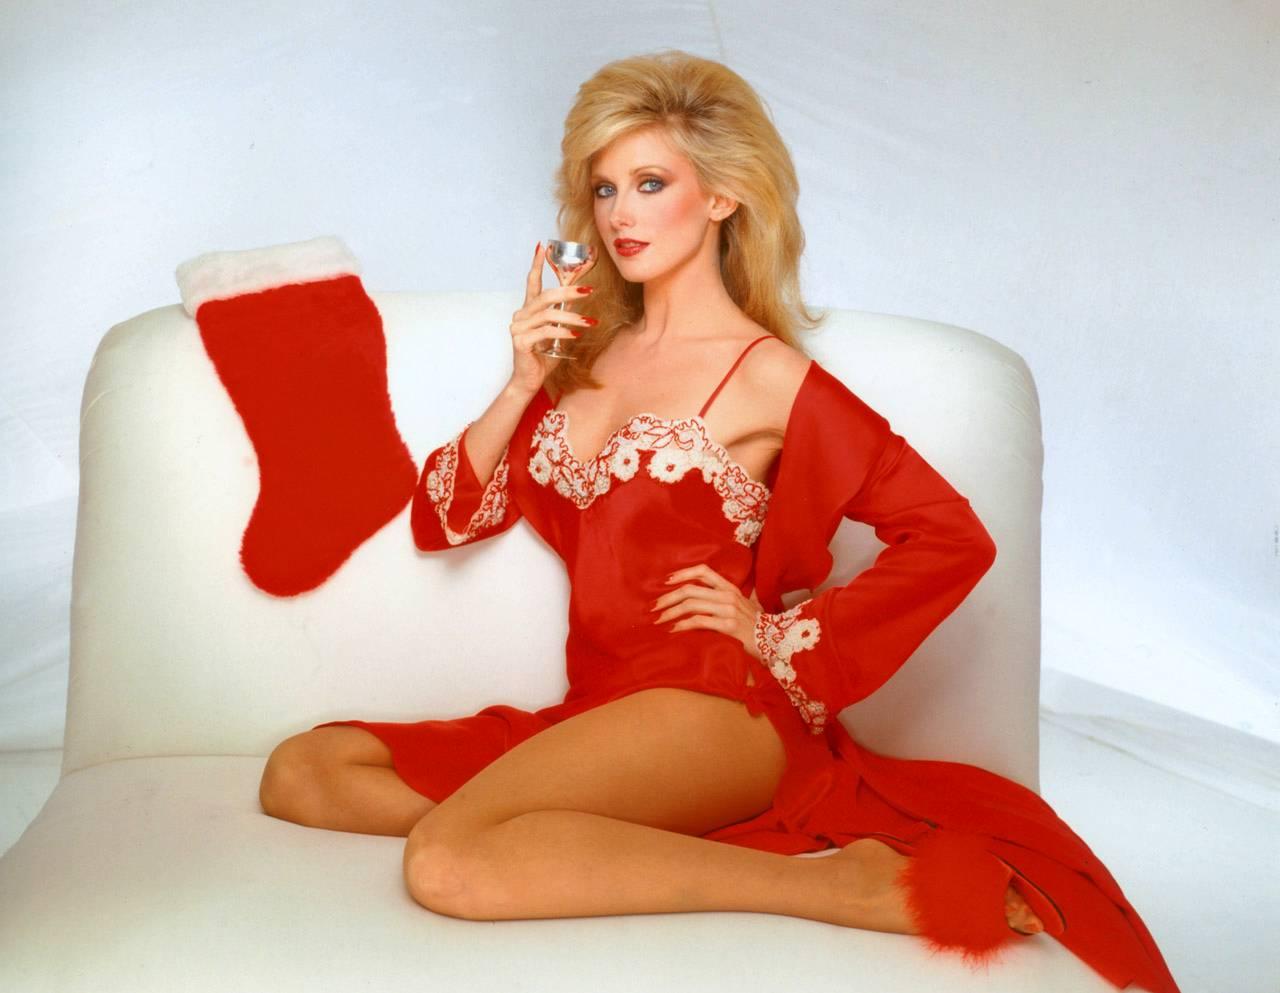 Morgan Fairchild S Christmas Morning Swing With Shad